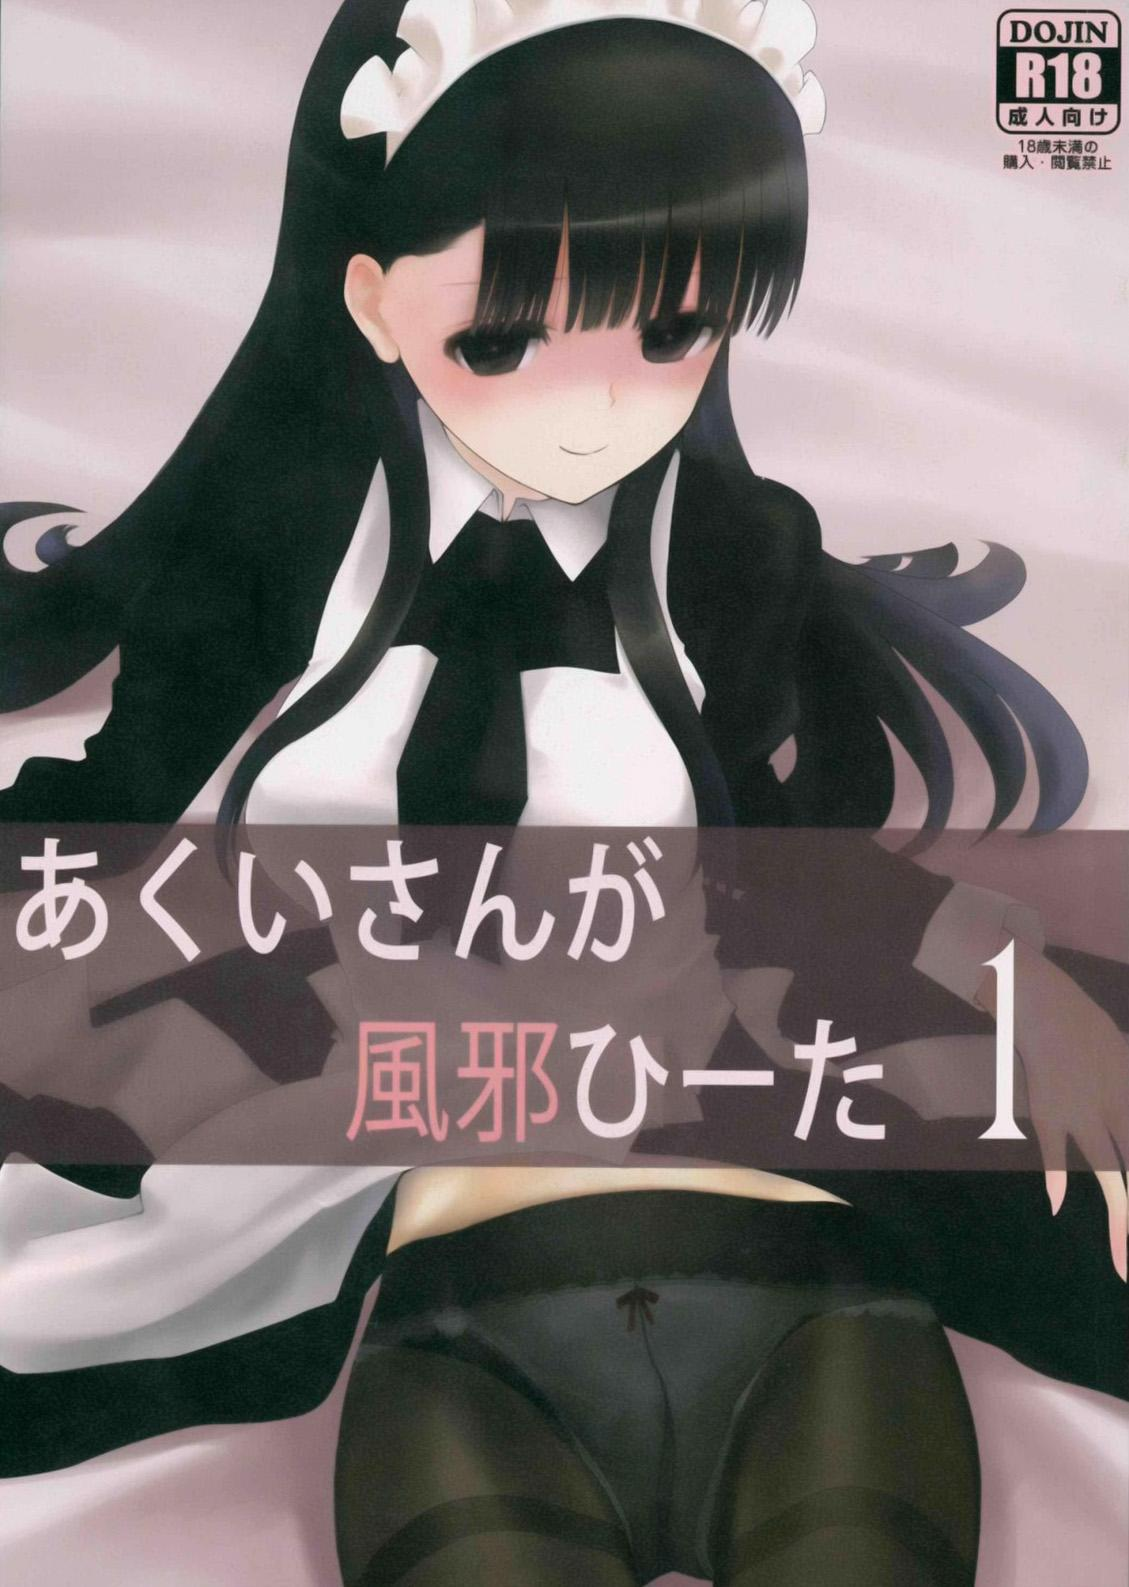 [Heikoushihenkei (Kawanakajima)] Akui-san ga Kaze hi-ta 1 | 阿九井小姐得了感冒1 [Chinese] [lolipoi汉化组] [2014-06-10] 1